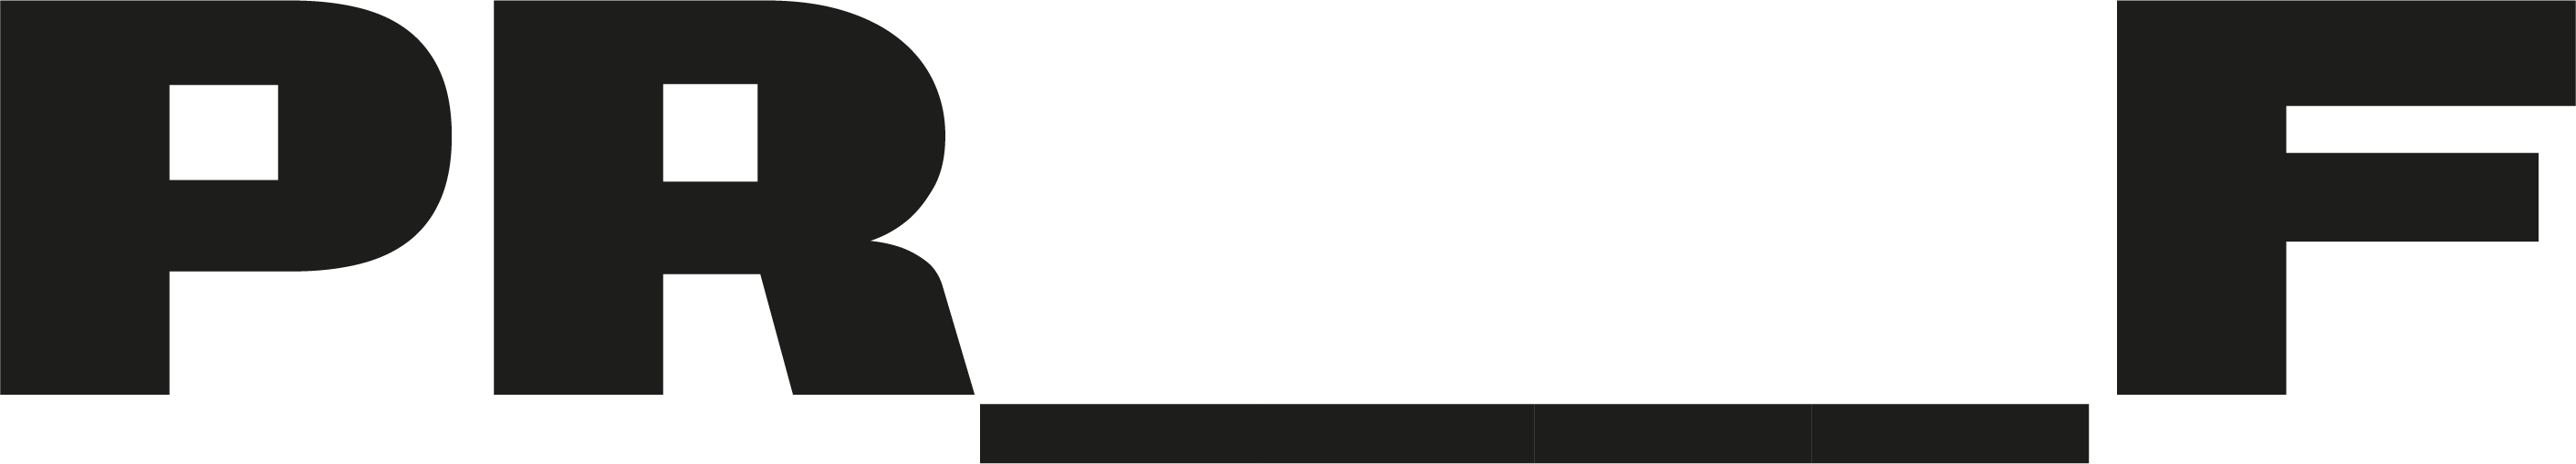 PR____F logo_black